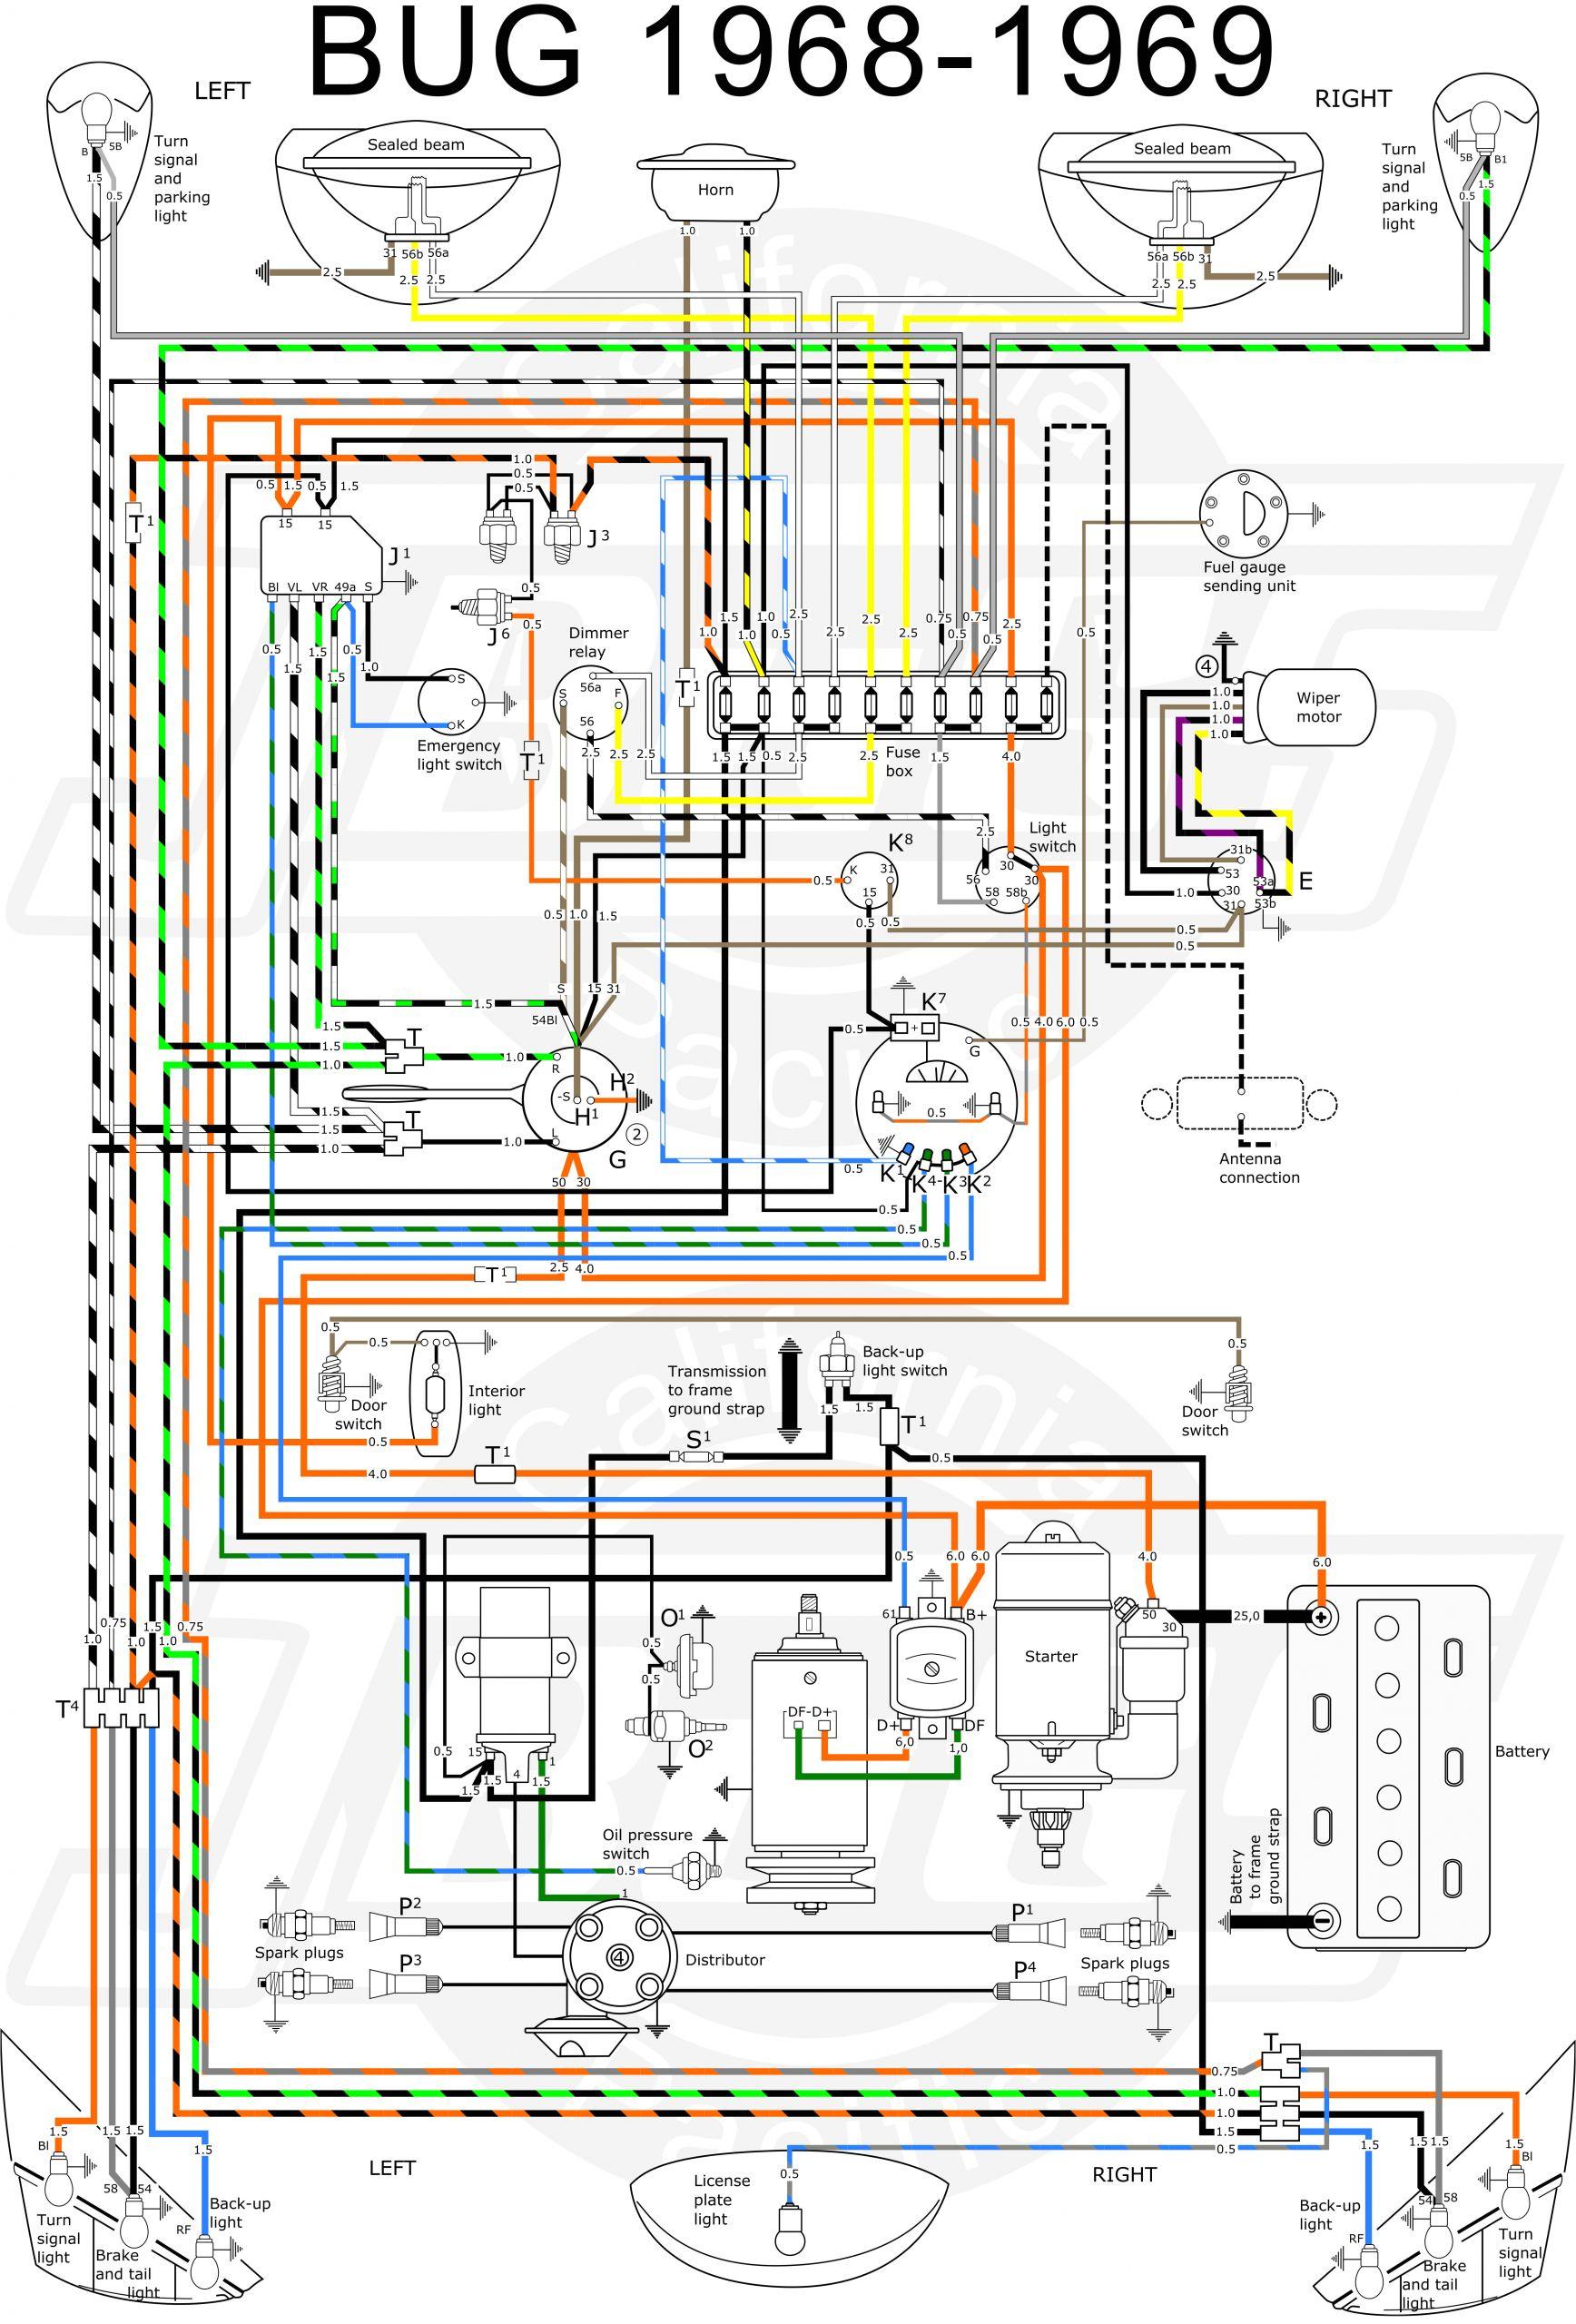 vw bug 1968 69 wiring diagram jpg